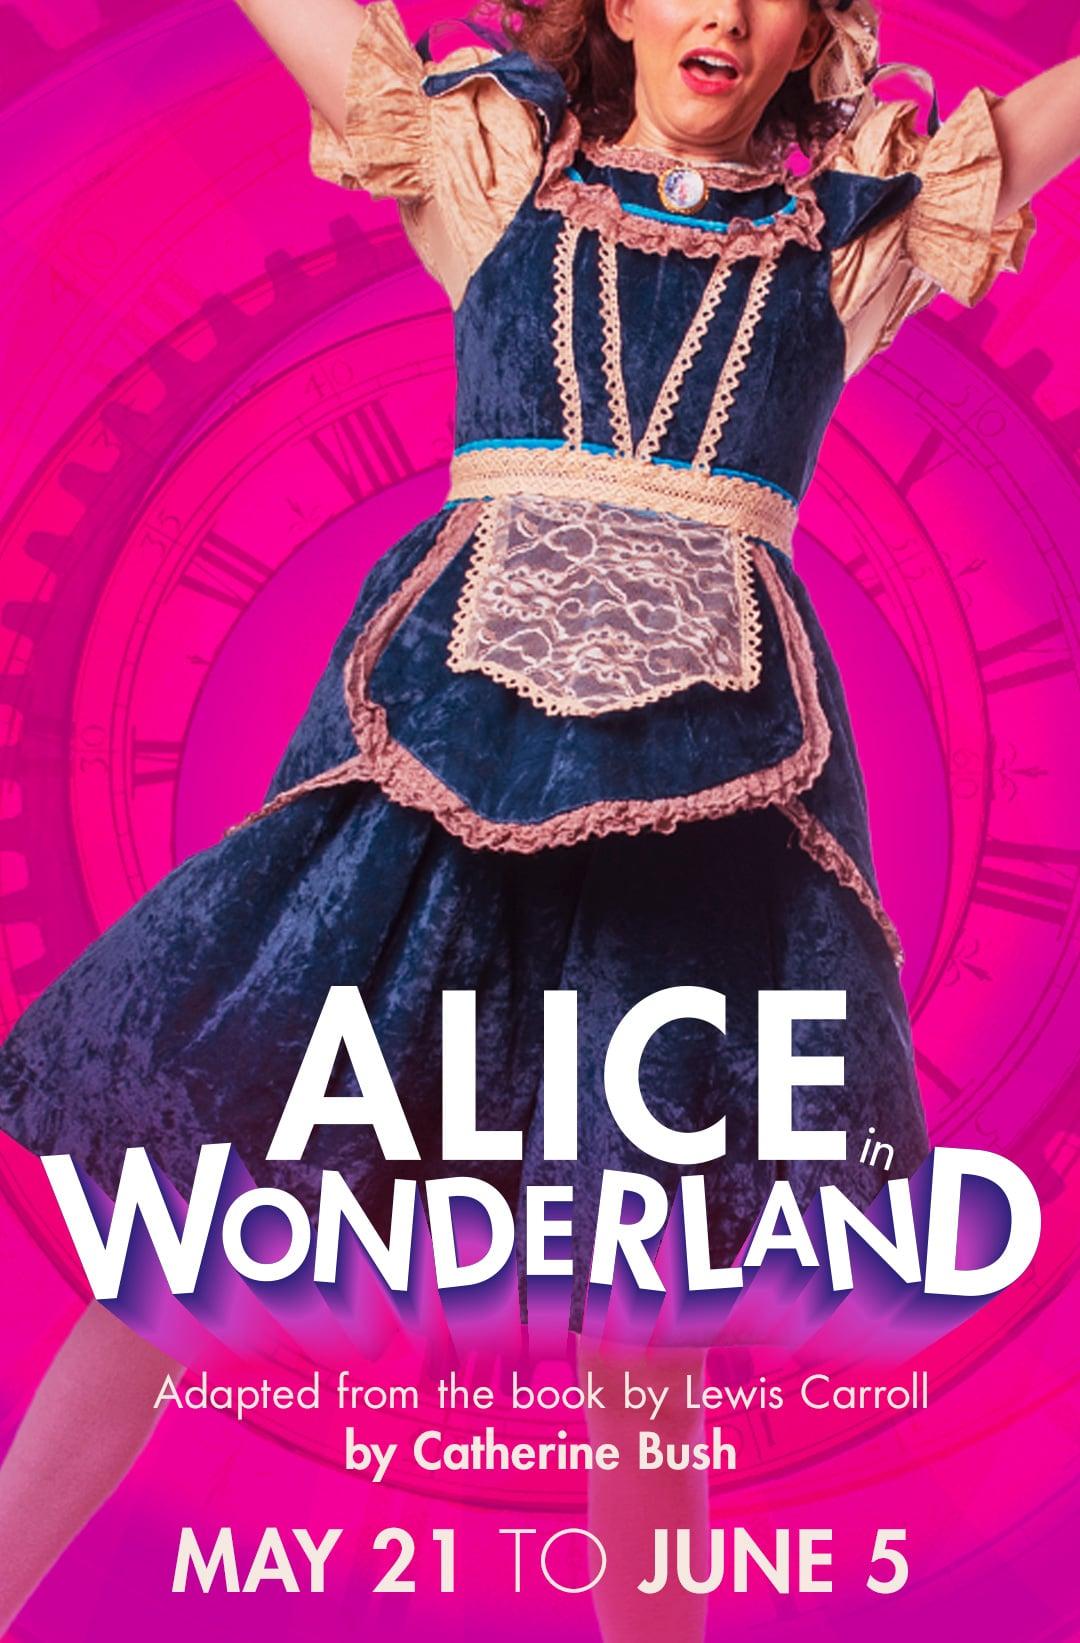 Alice in Wonderland at Barter Theatre Moonlite Drive In